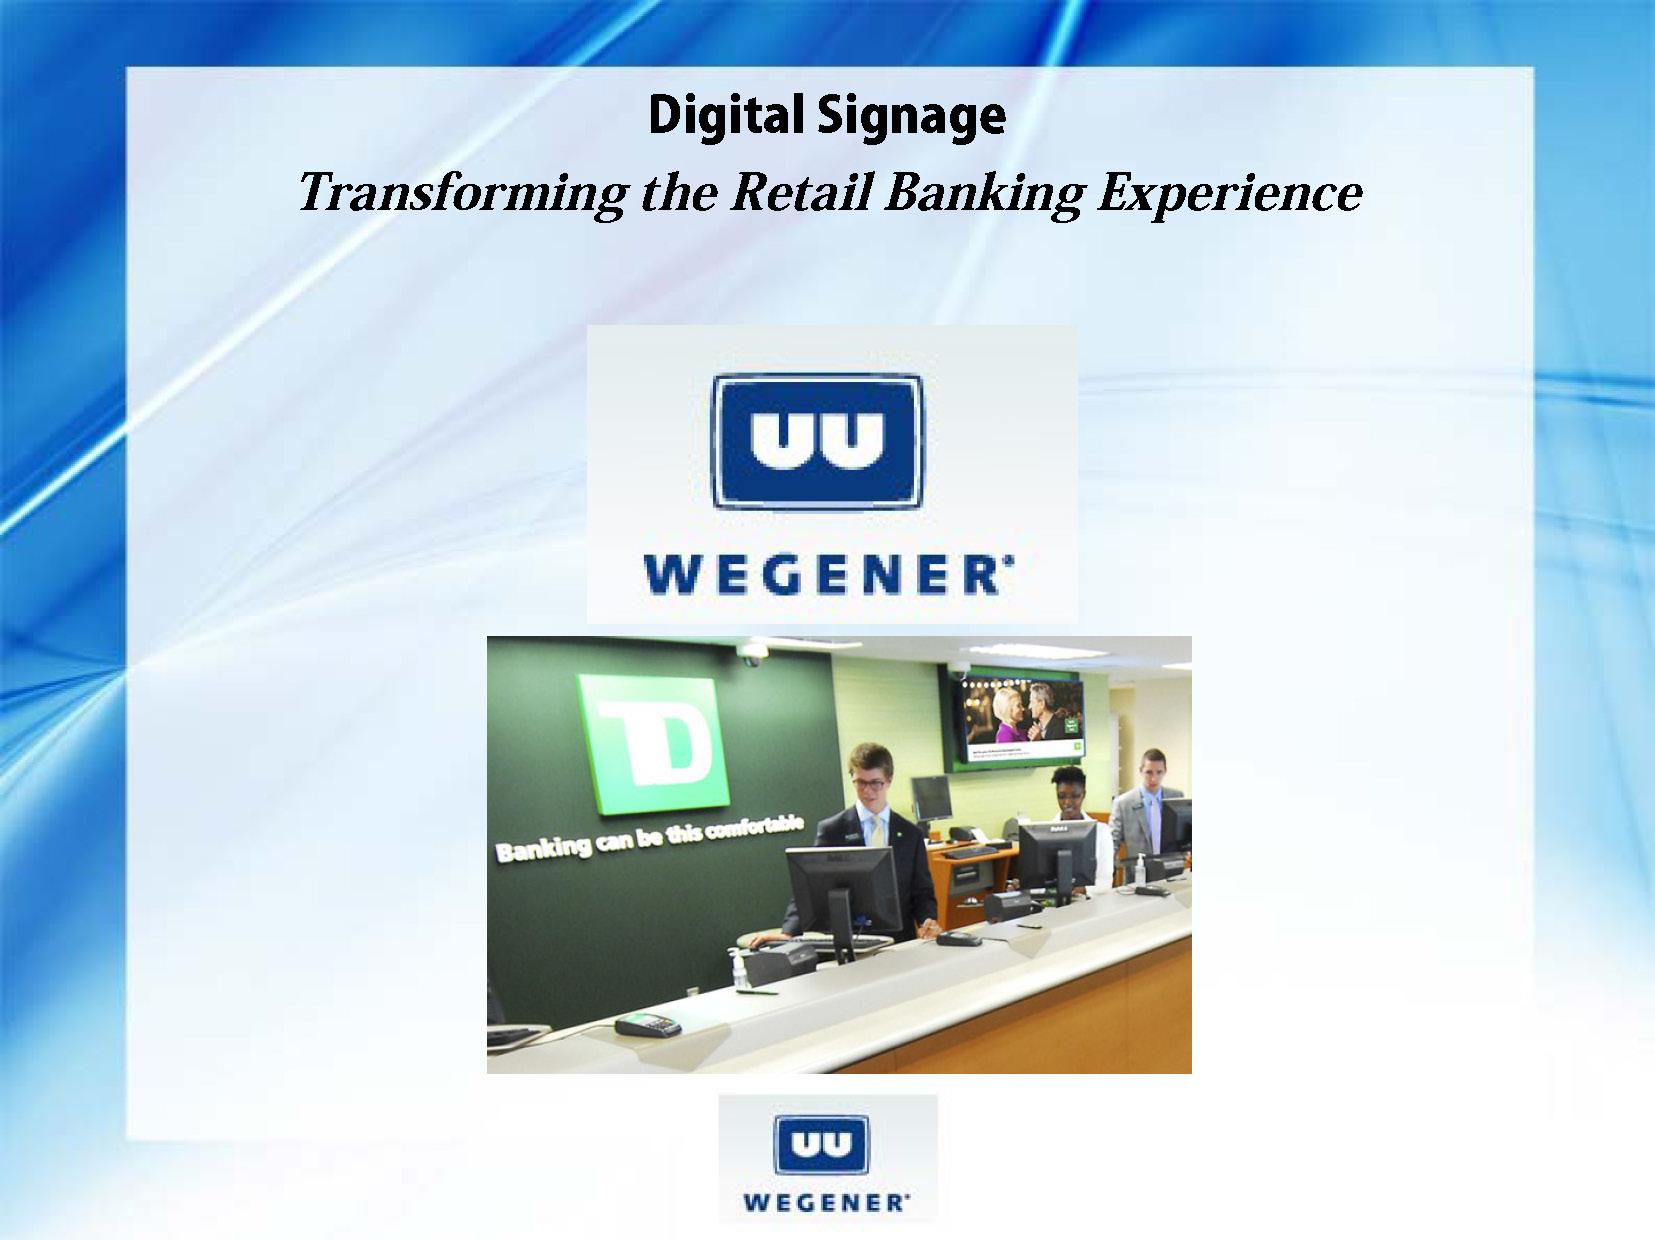 Wegner Digital Signage